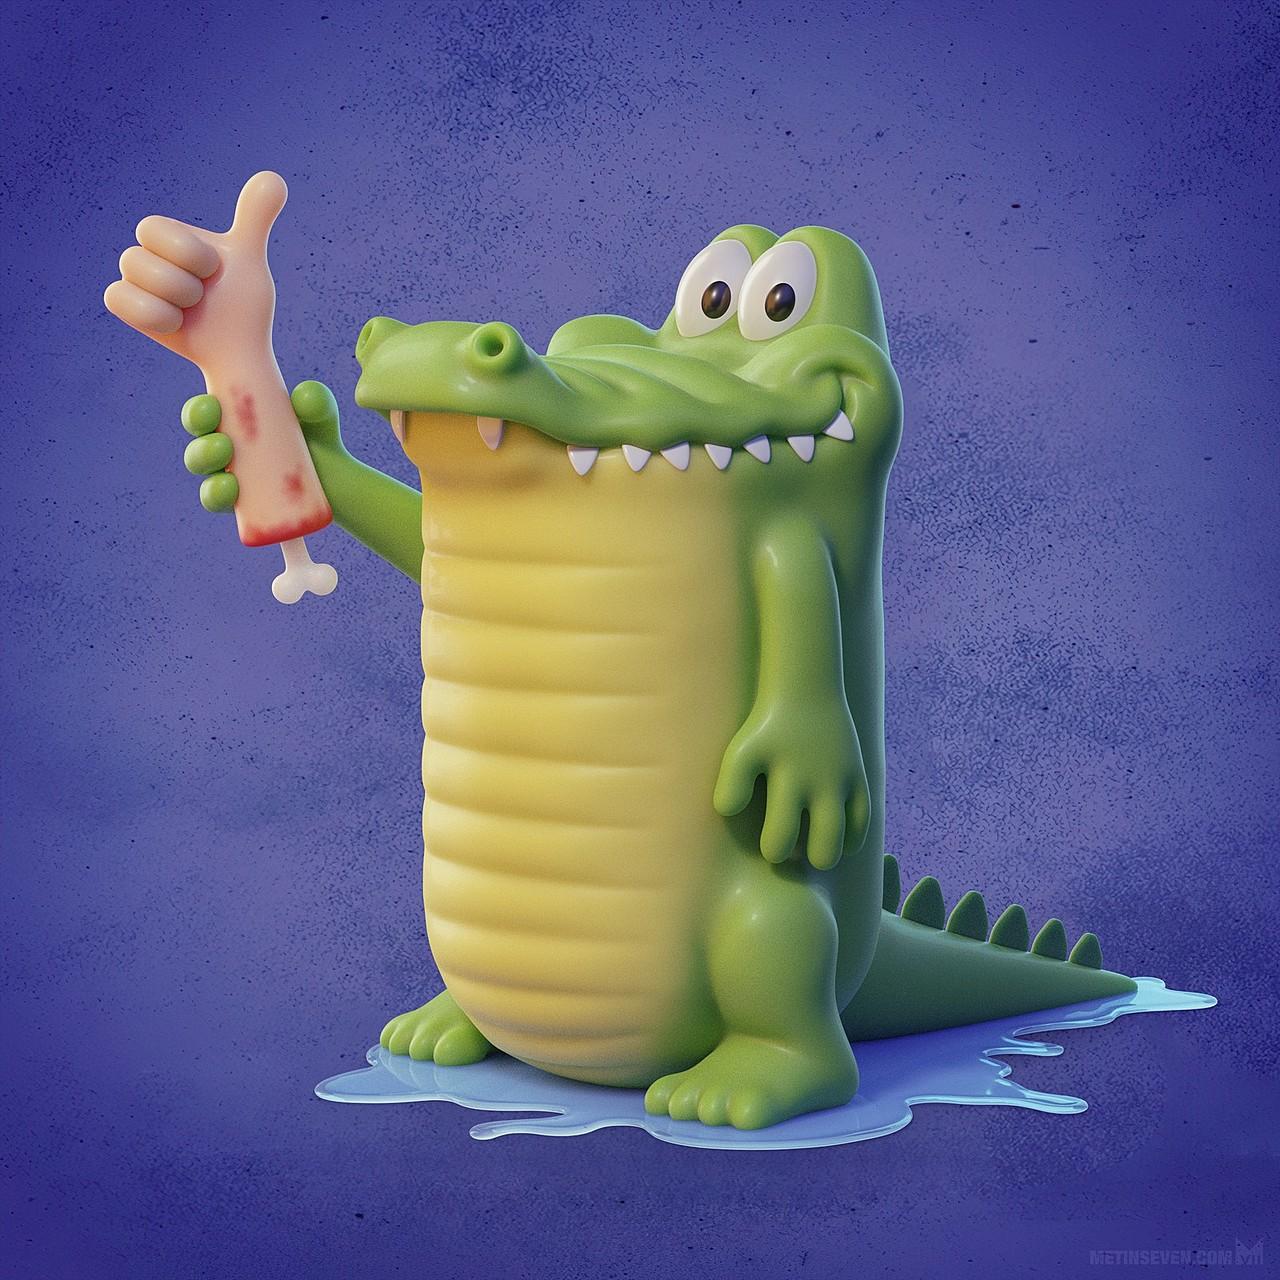 Thumbs up— Cute 3D crocodile cartoon character design